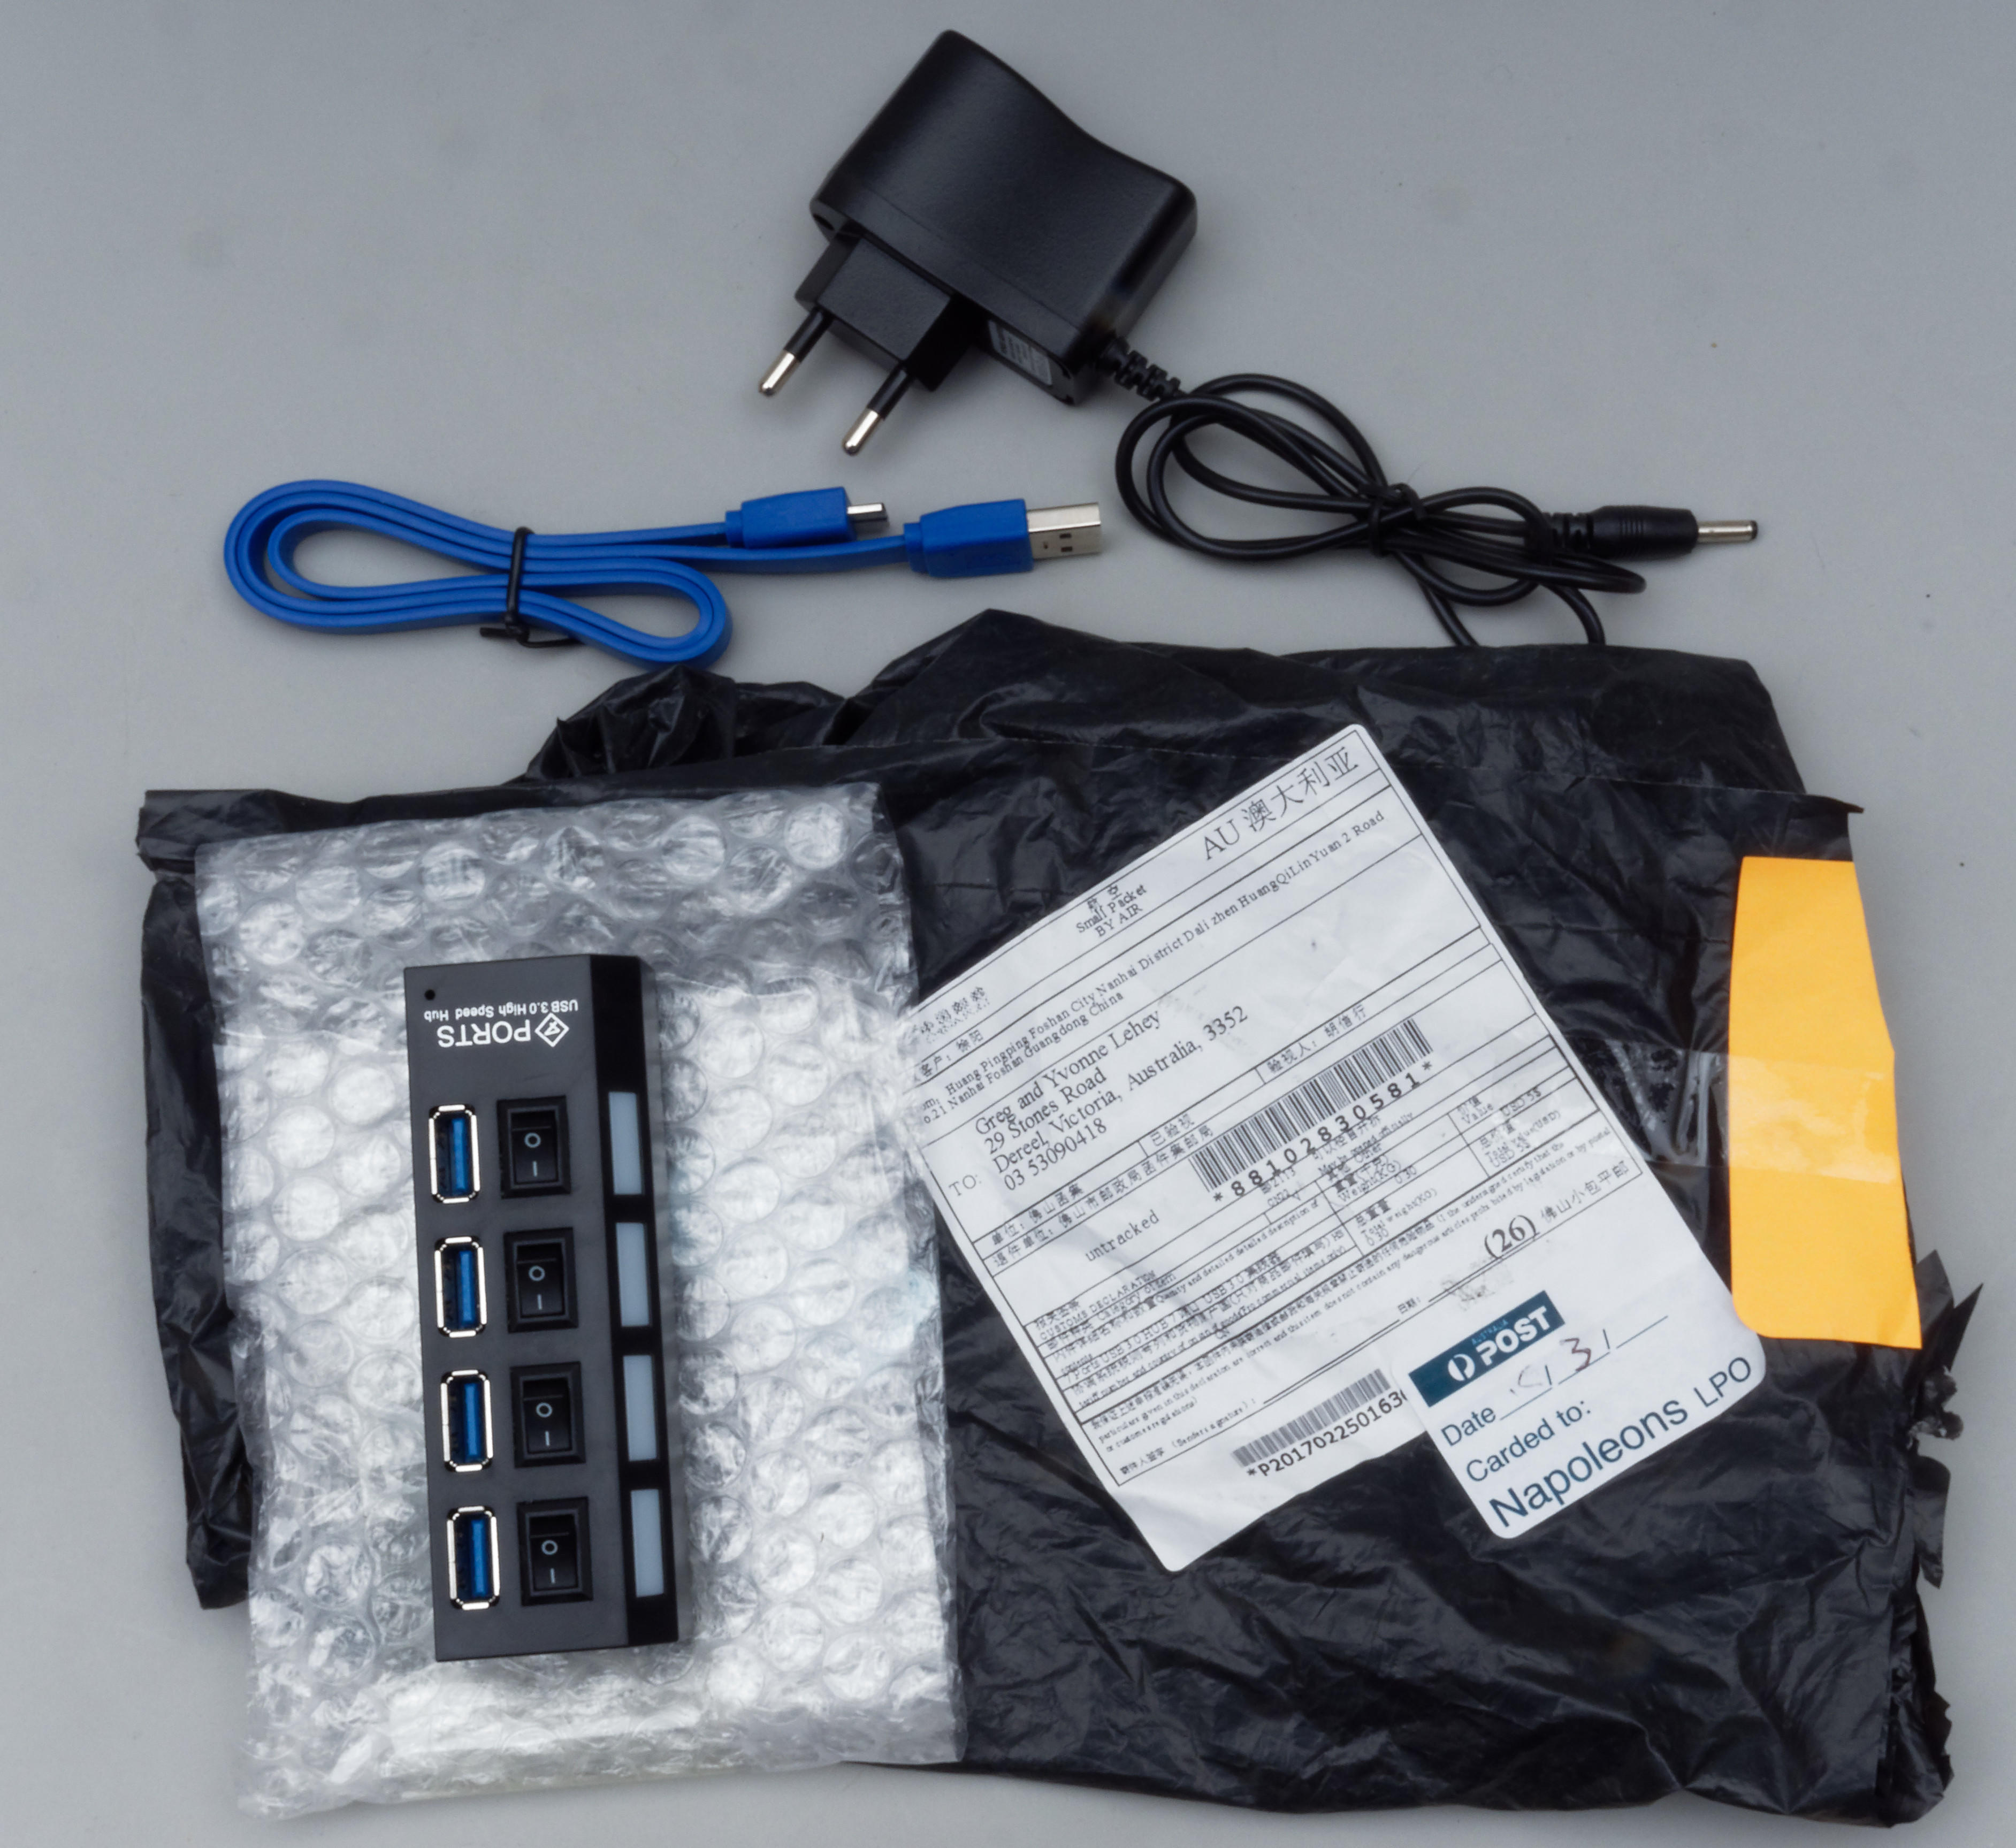 USB-4-port-hub-3.jpeg